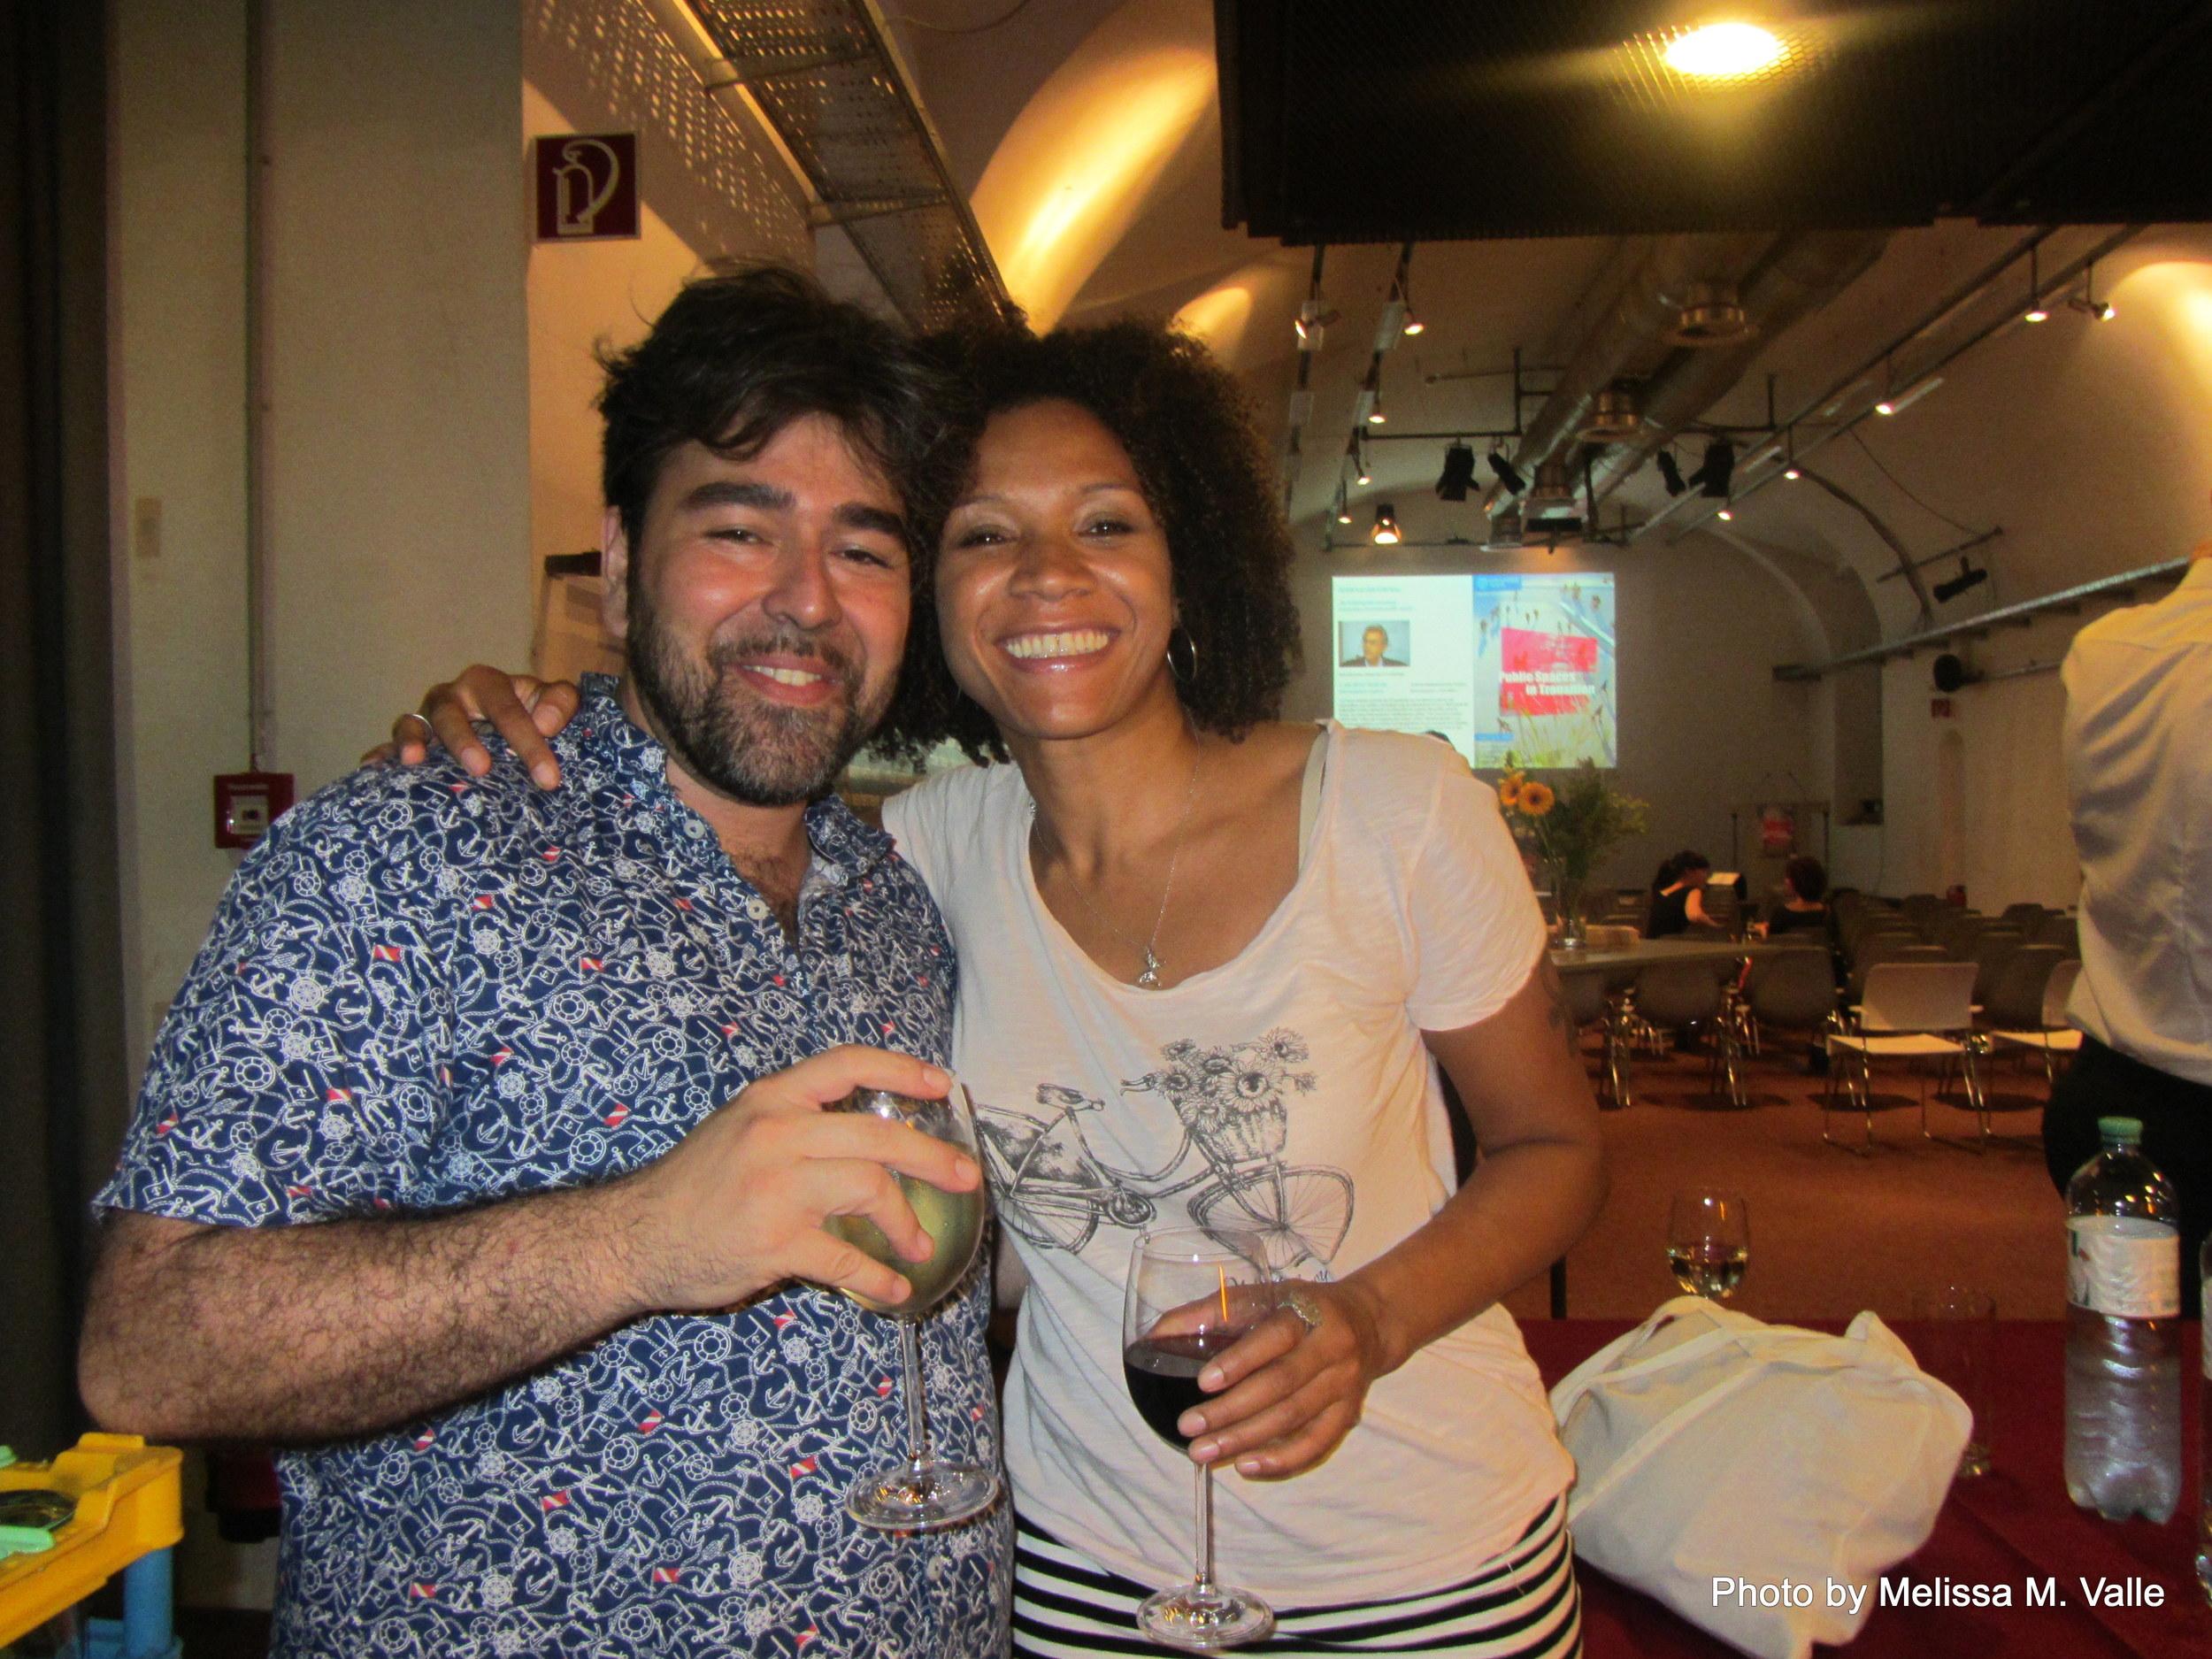 7.7.14 Vienna, Austria-wining it up in Museum Quartier after Amin lecture (5)- me and Estuardo.JPG